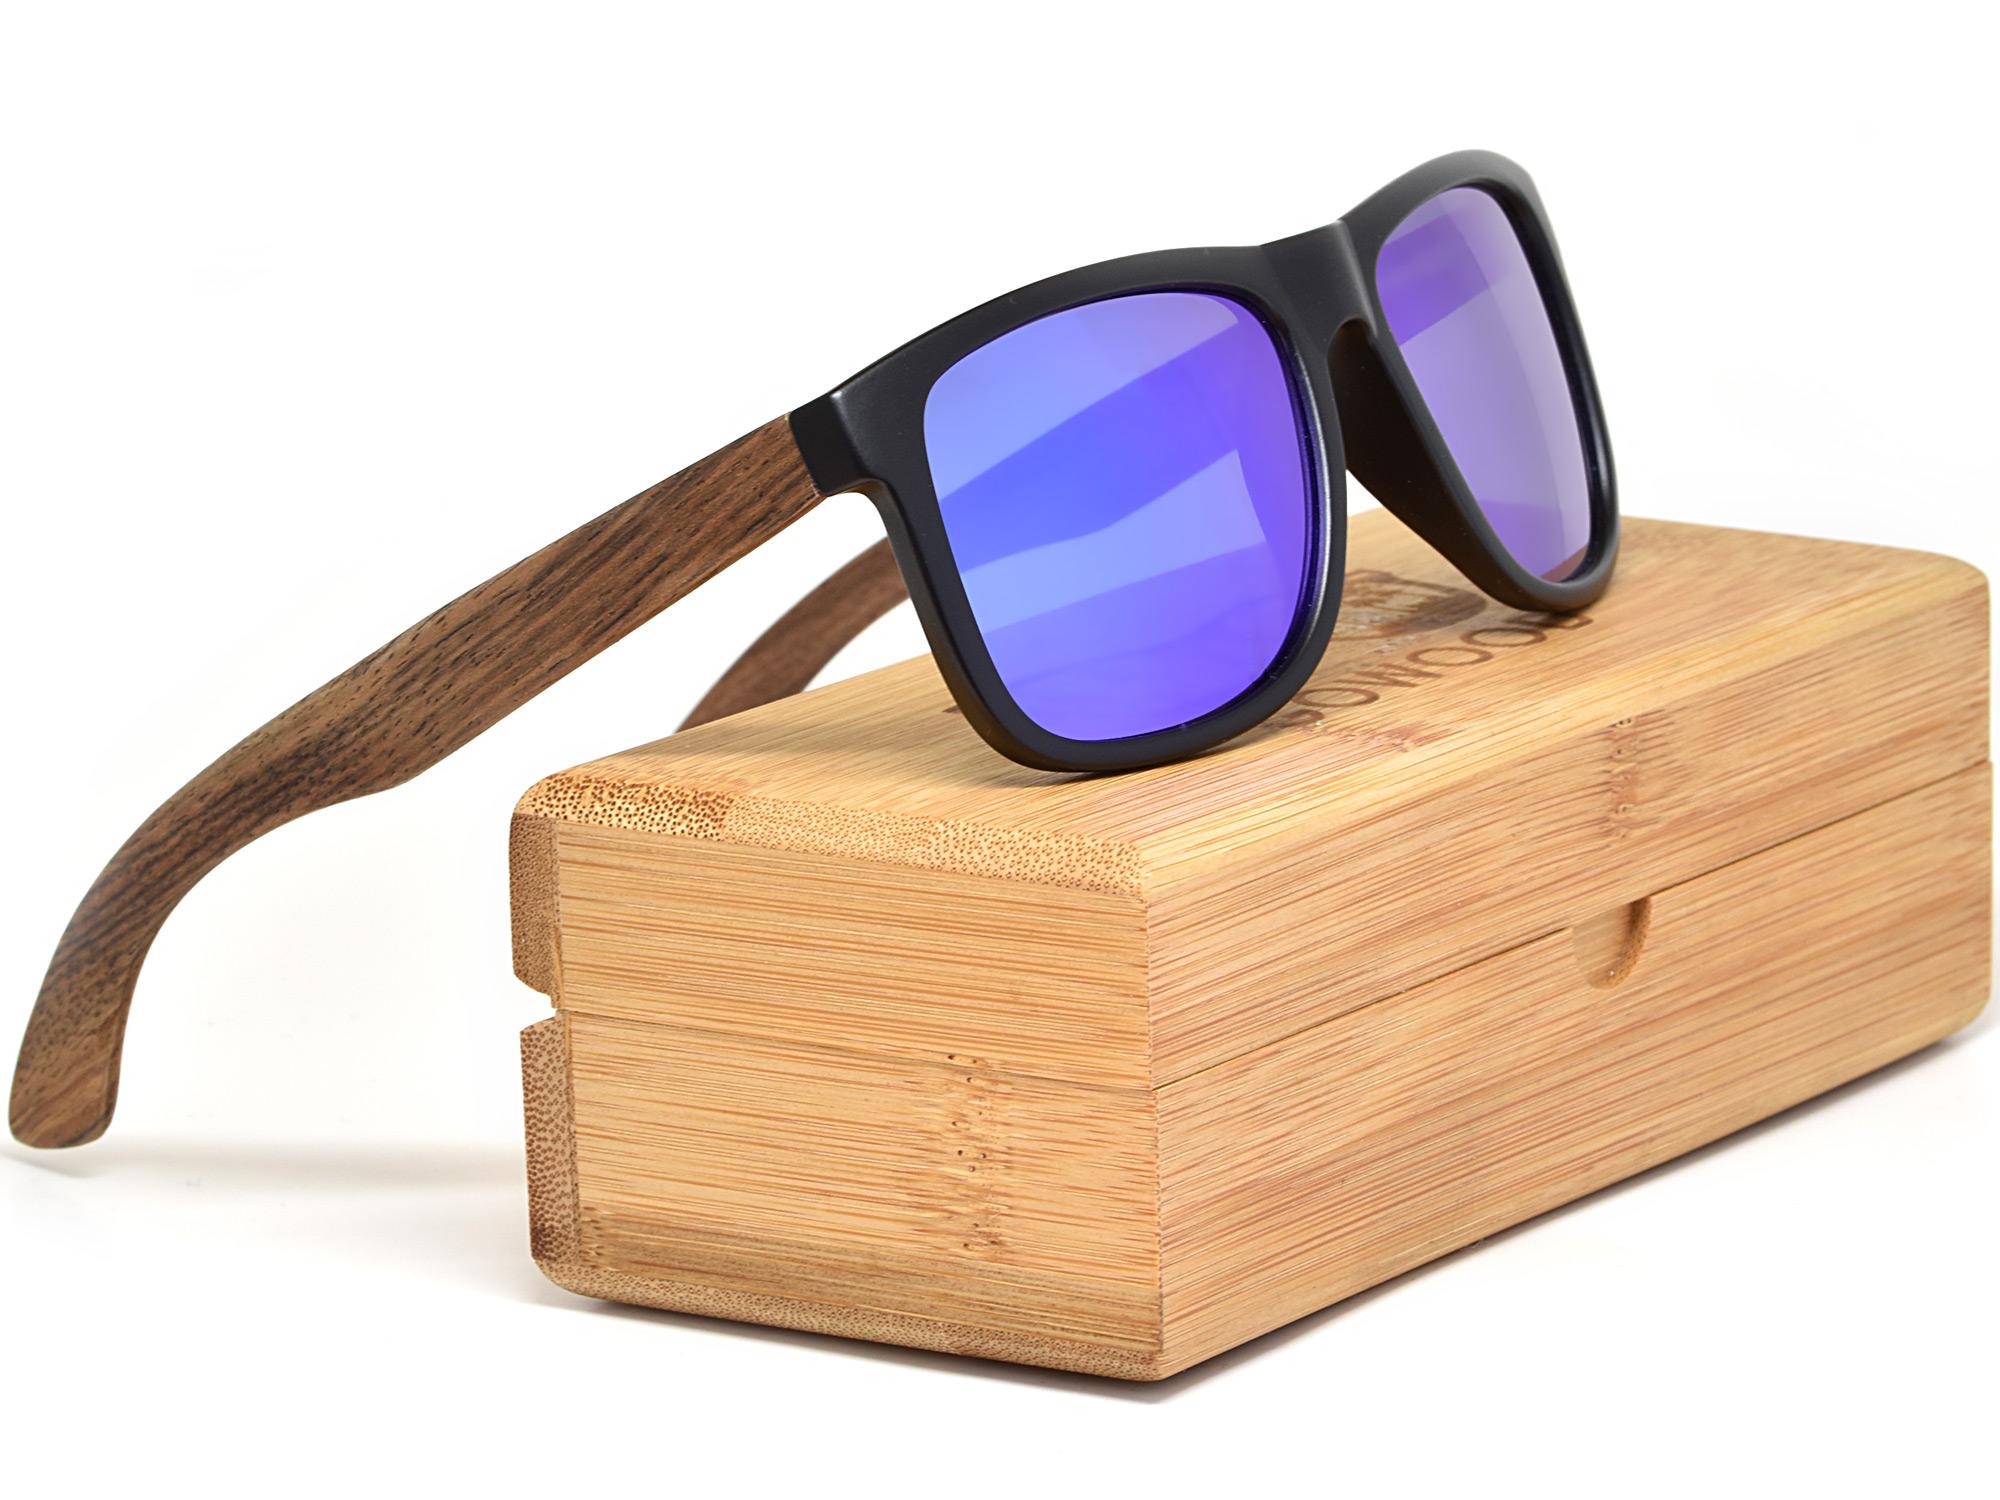 Square walnut wood sunglasses with blue mirrored polarized lenses set